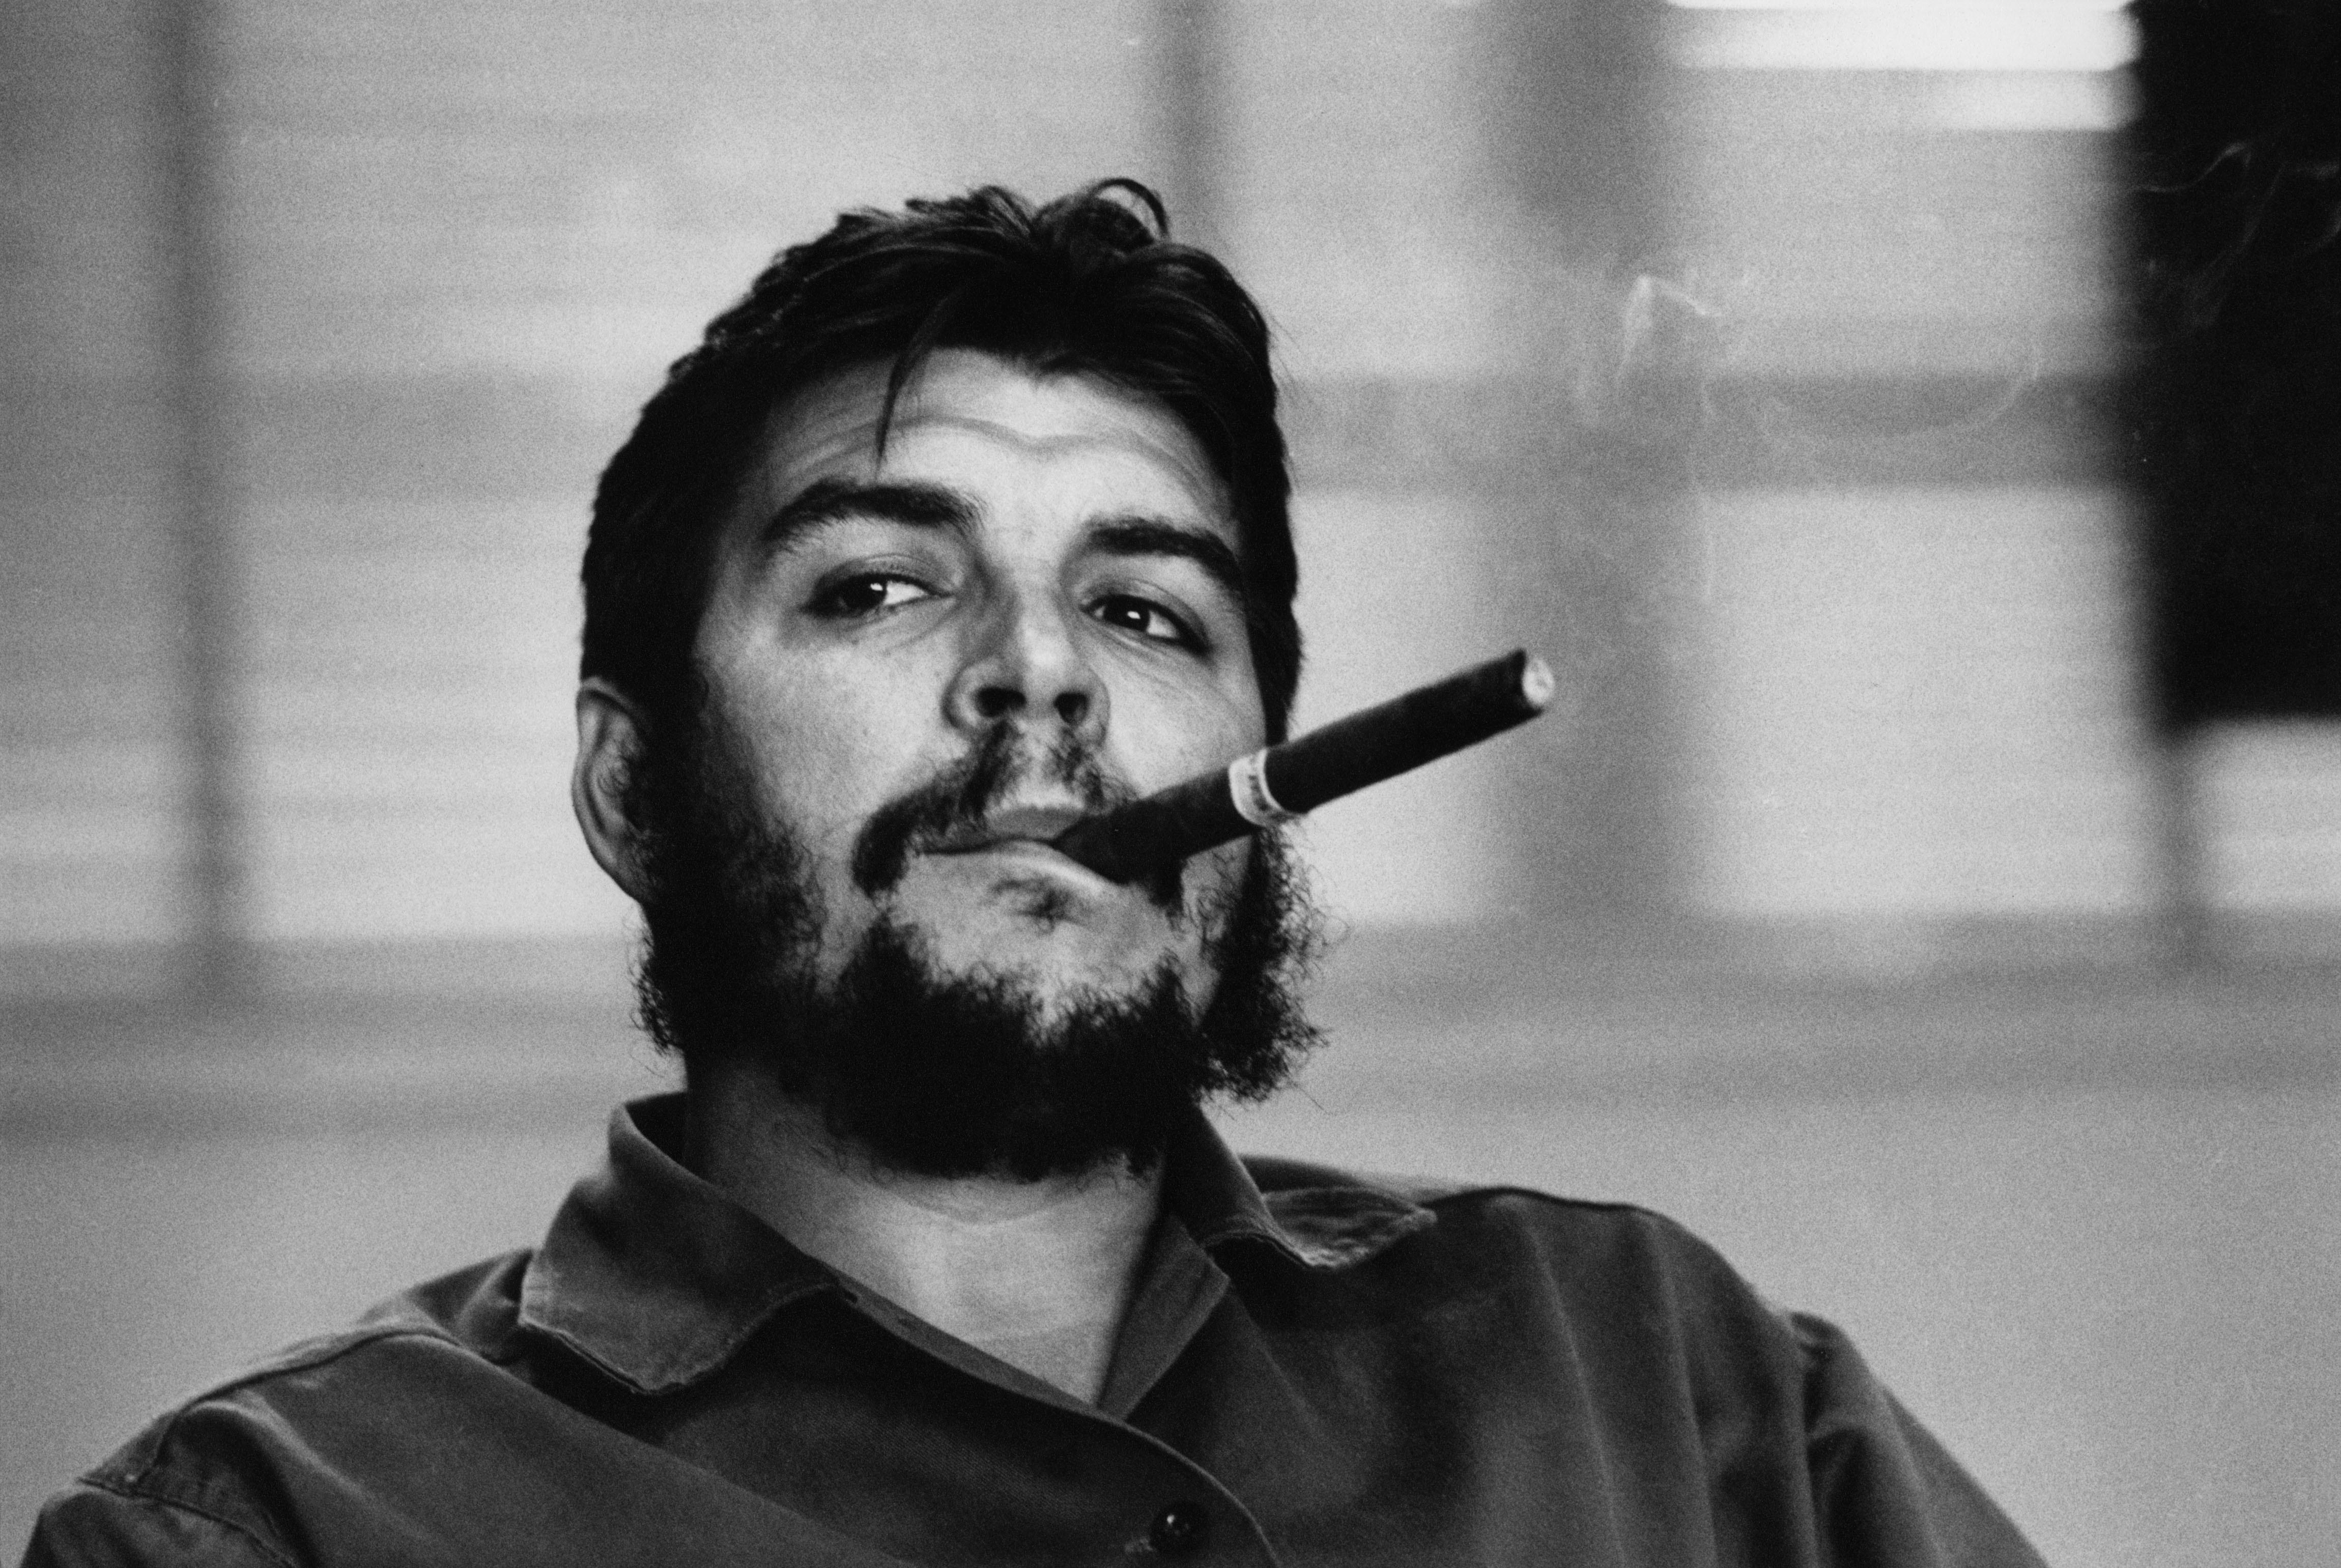 men white black monochrome portrait photography hair moustache revolutionary Che Guevara Argentina cigars Cuba man beard